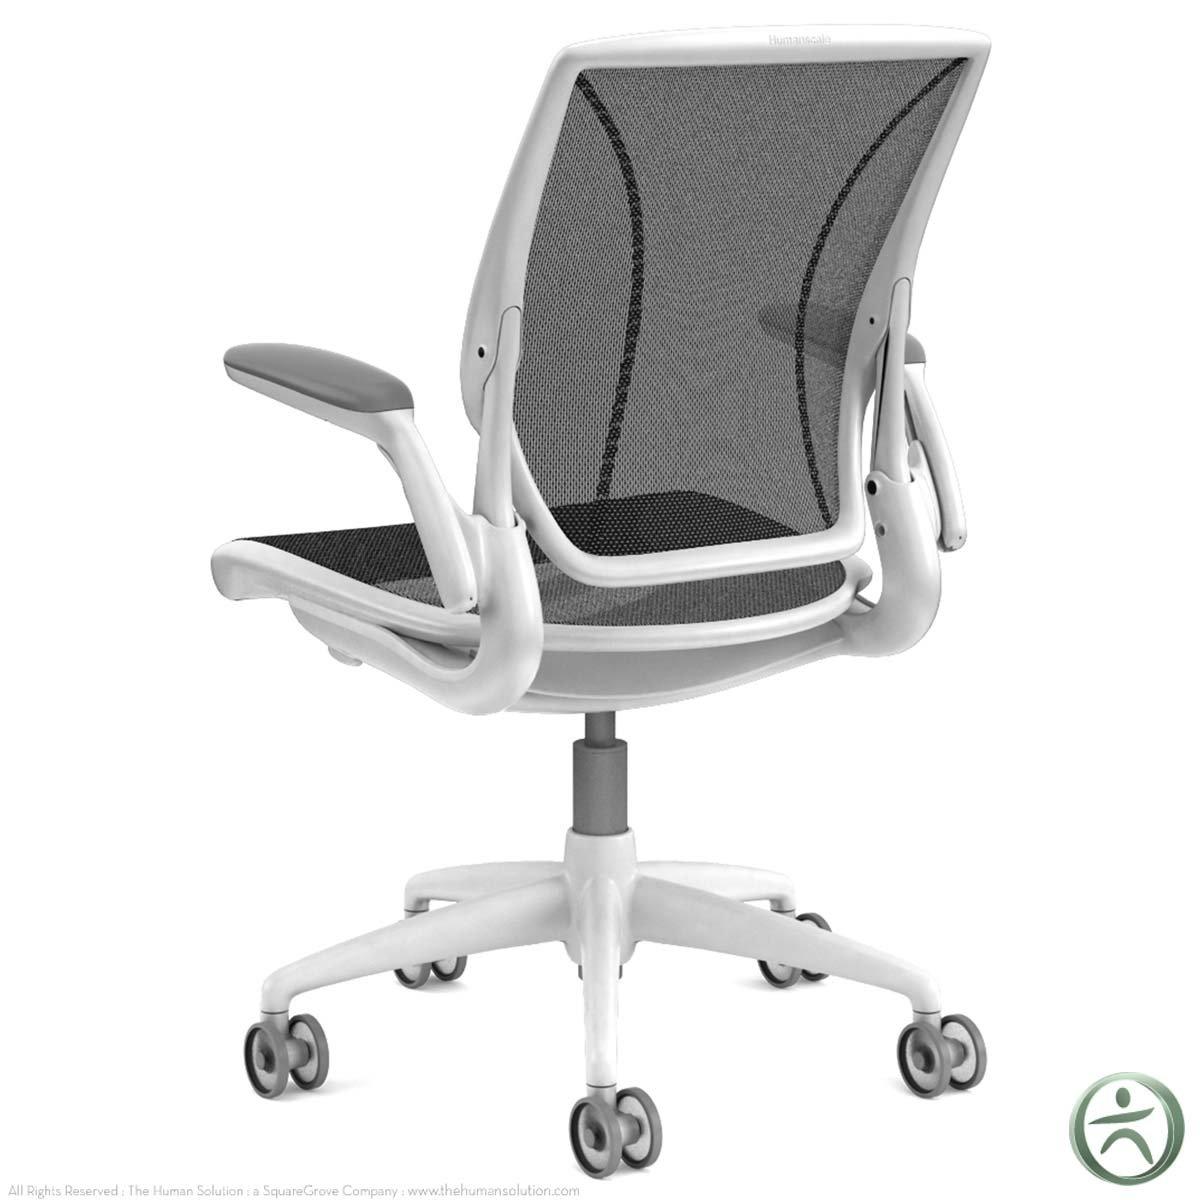 Humanscale chair assembly - Humanscale Chair Assembly 25